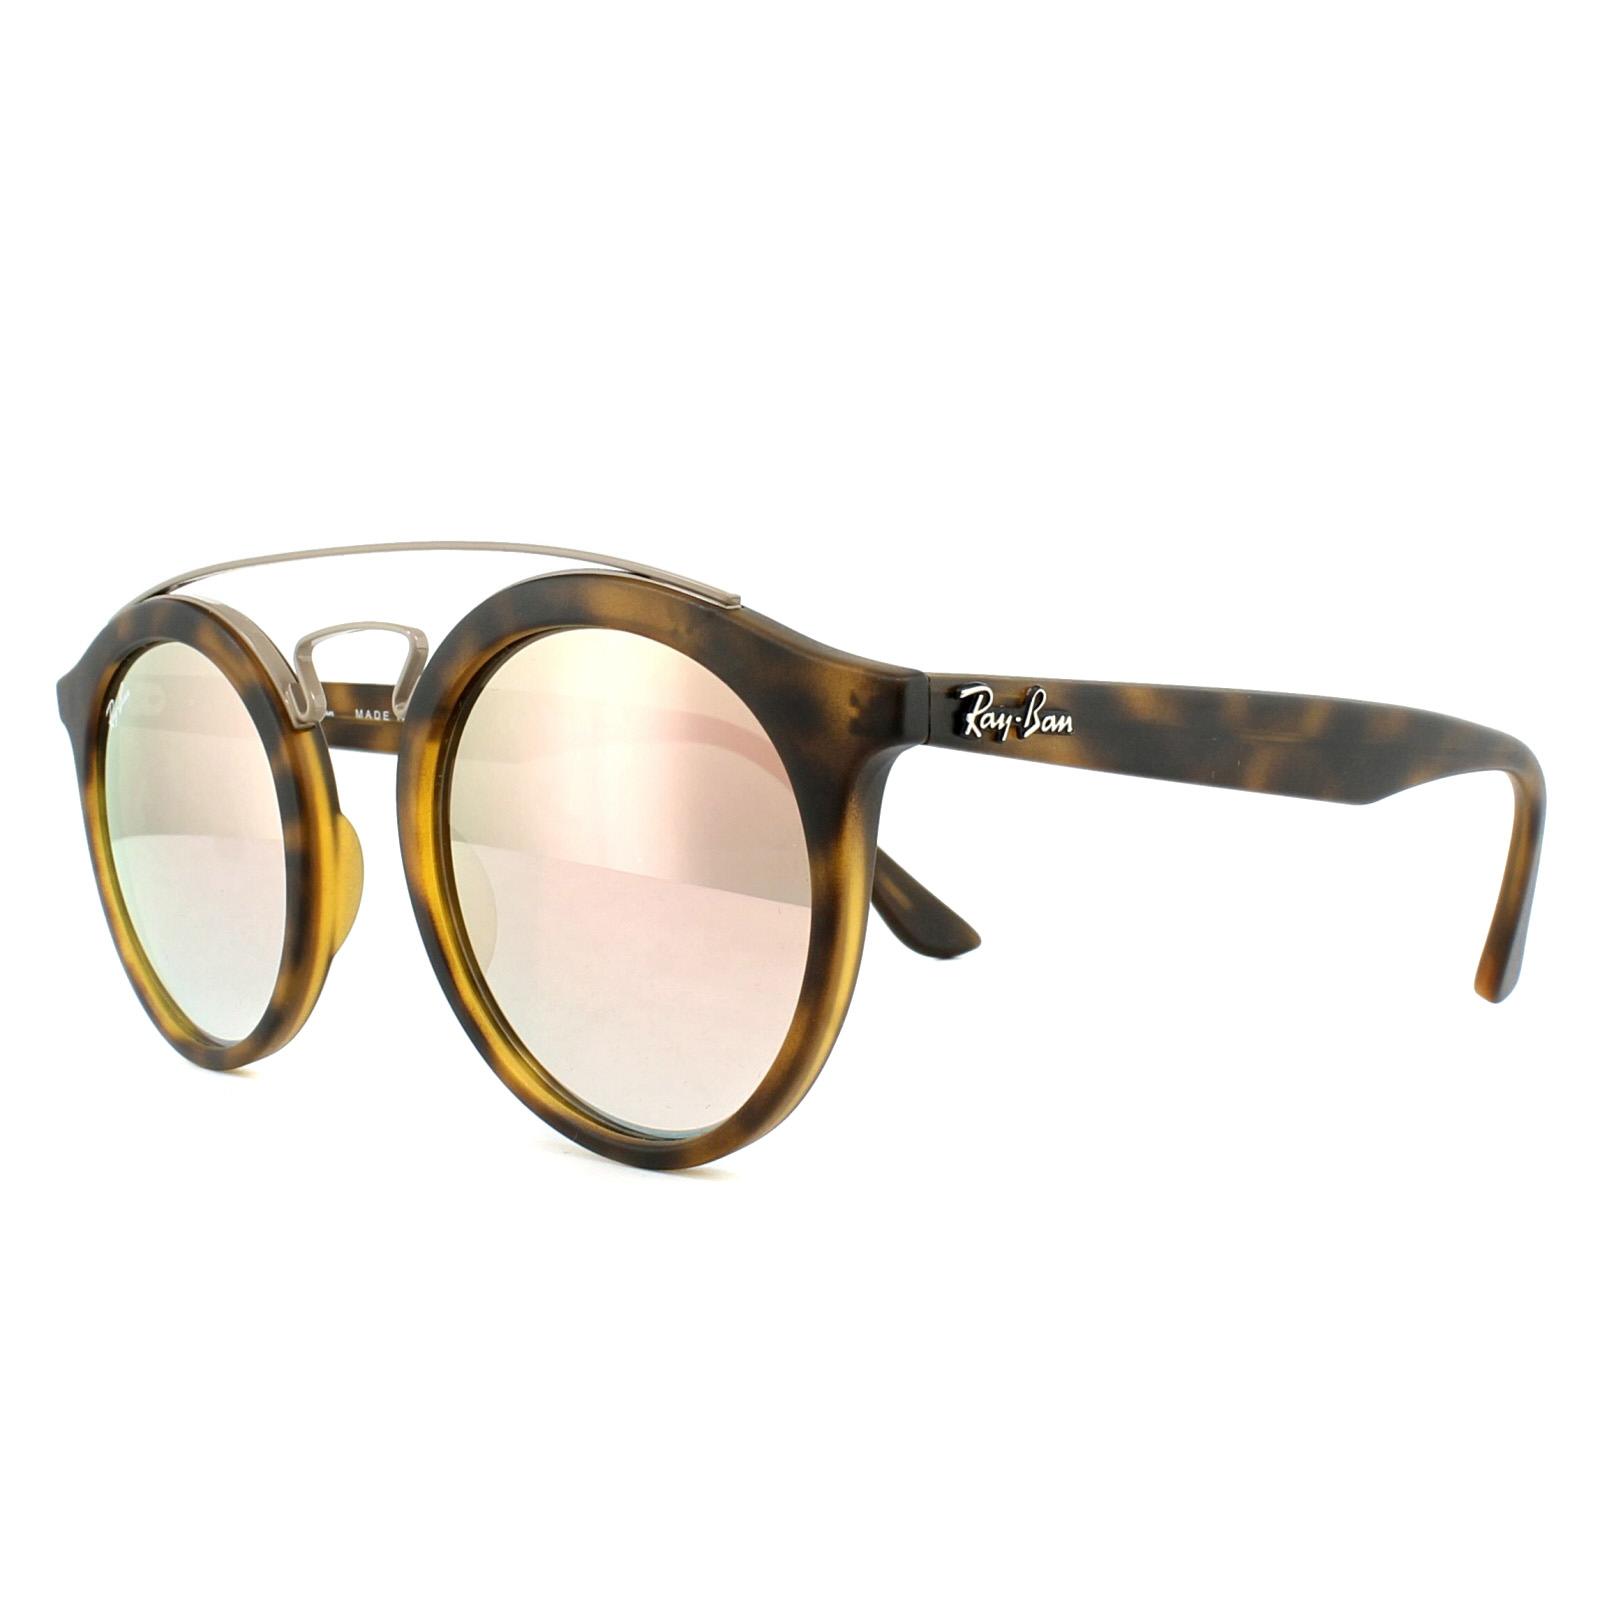 ad9dfb2f3d5 Sentinel Ray-Ban Sunglasses Gatsby 4256 6267B9 Tortoise Copper Gradient  Mirror 46mm